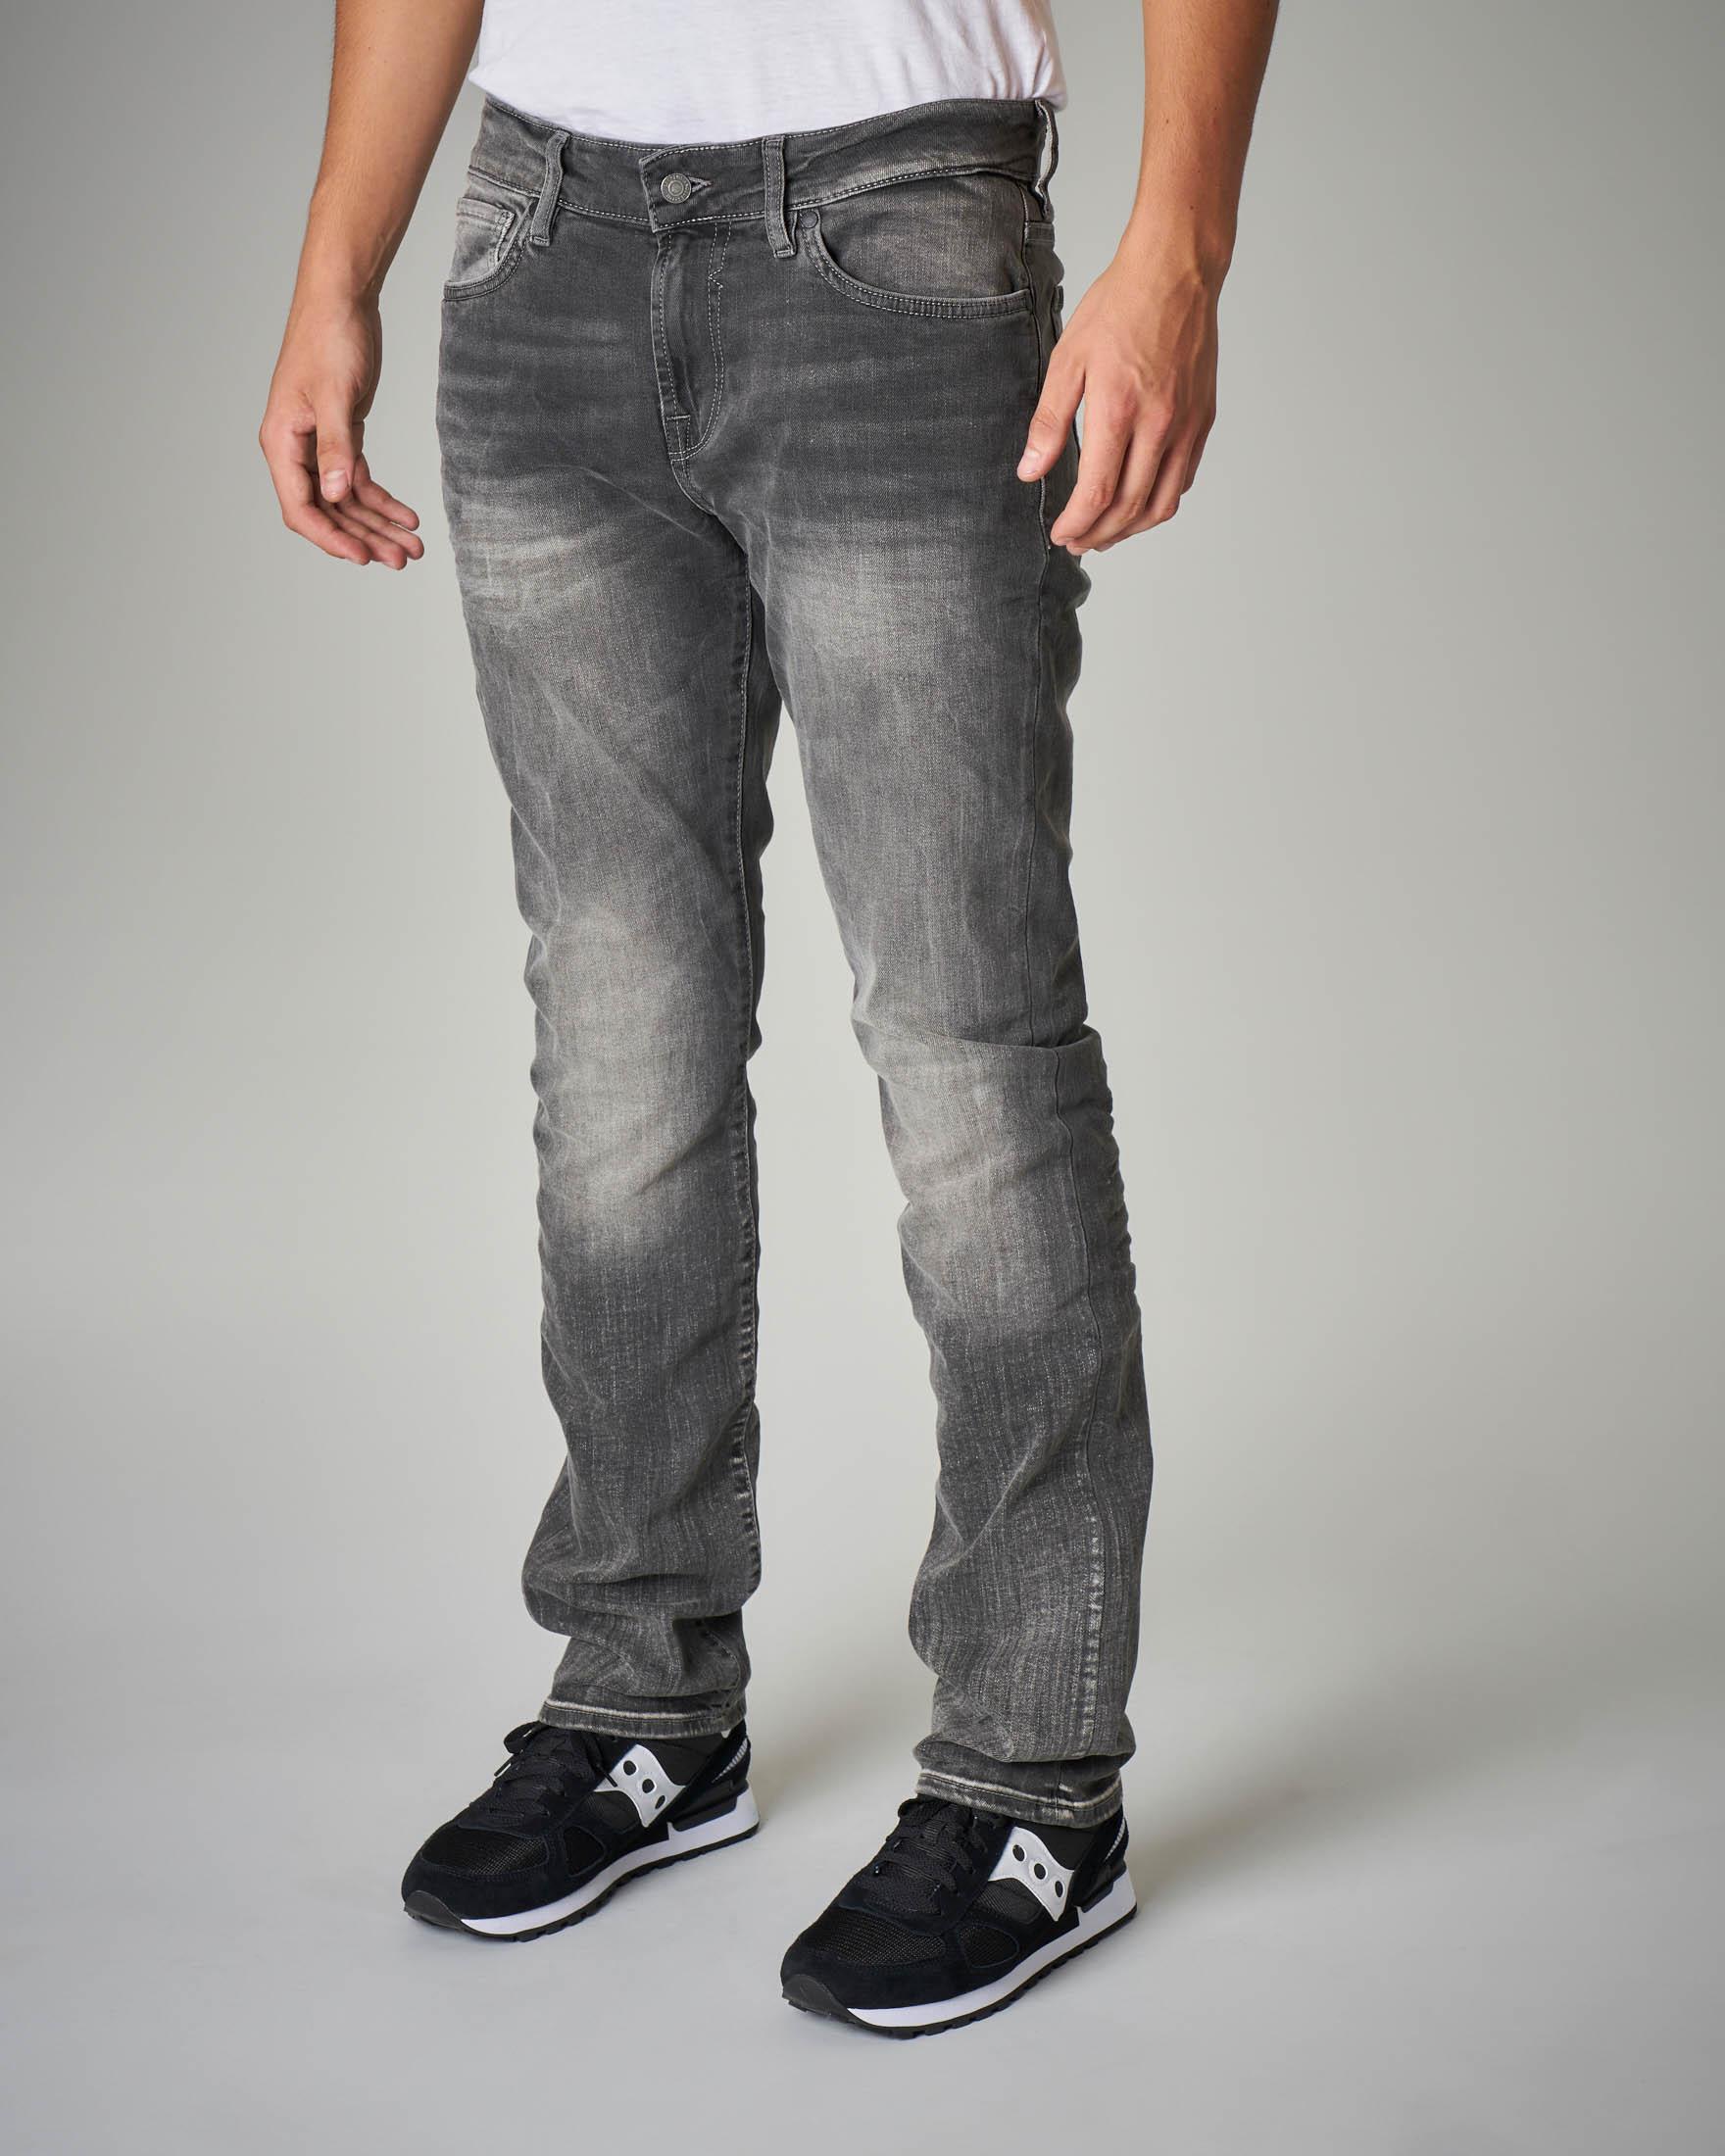 Jeans skinny grigio con sbiancature